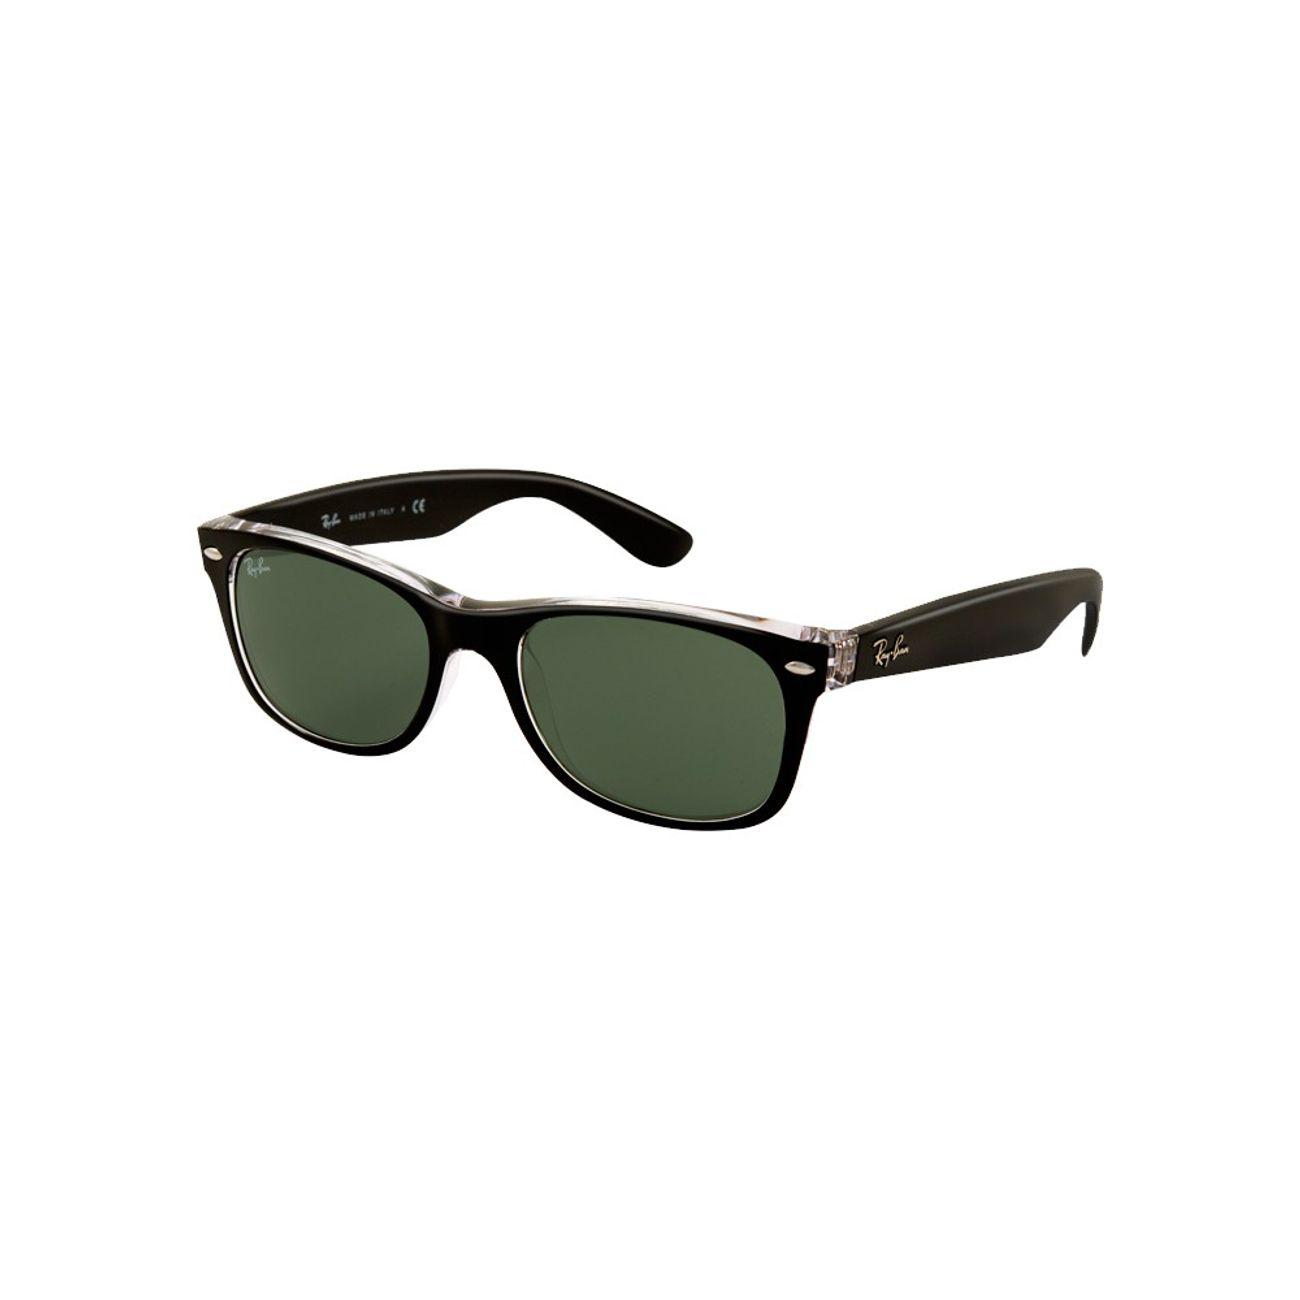 935ca6fd75de8b Mode- Lifestyle RAYBAN Ray-Ban New Wayfarer Medium Noir Transparent G-15